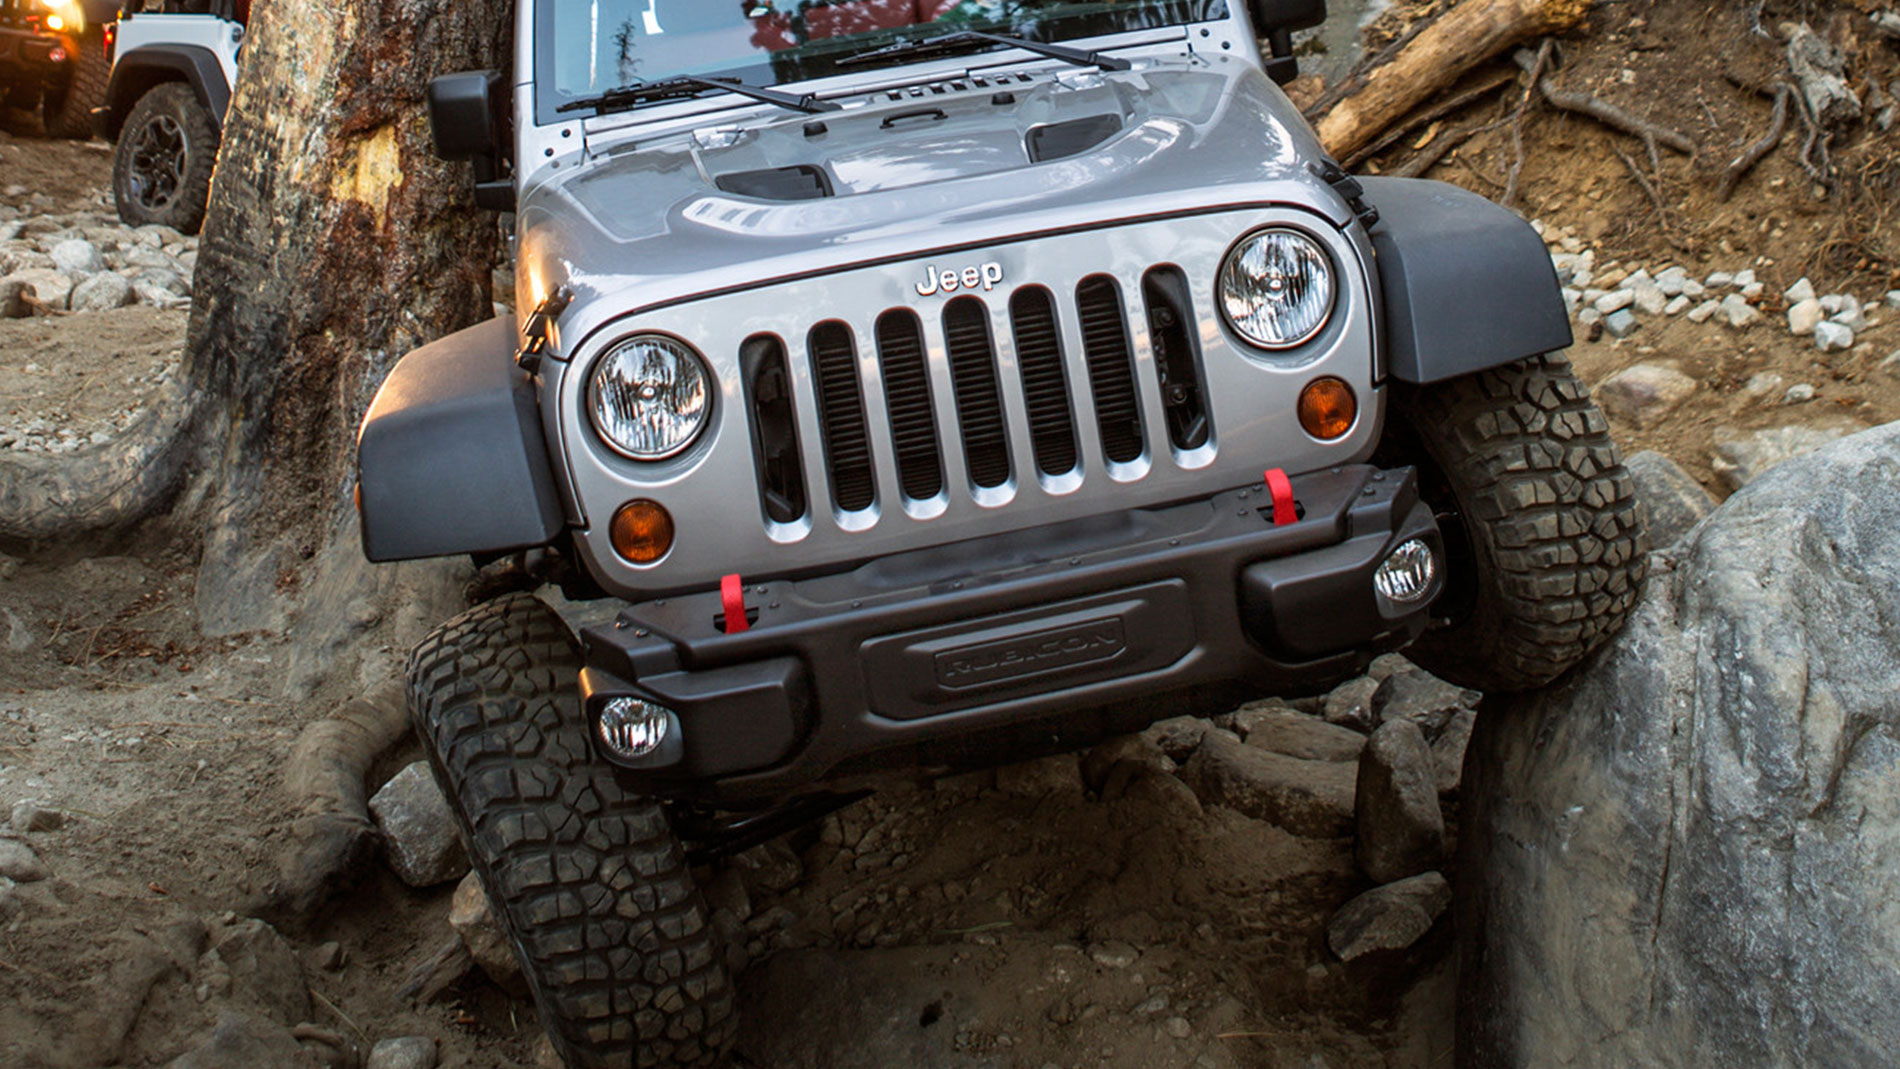 New 2017 Jeep Wrangler Unlimited Lease near Boston MA